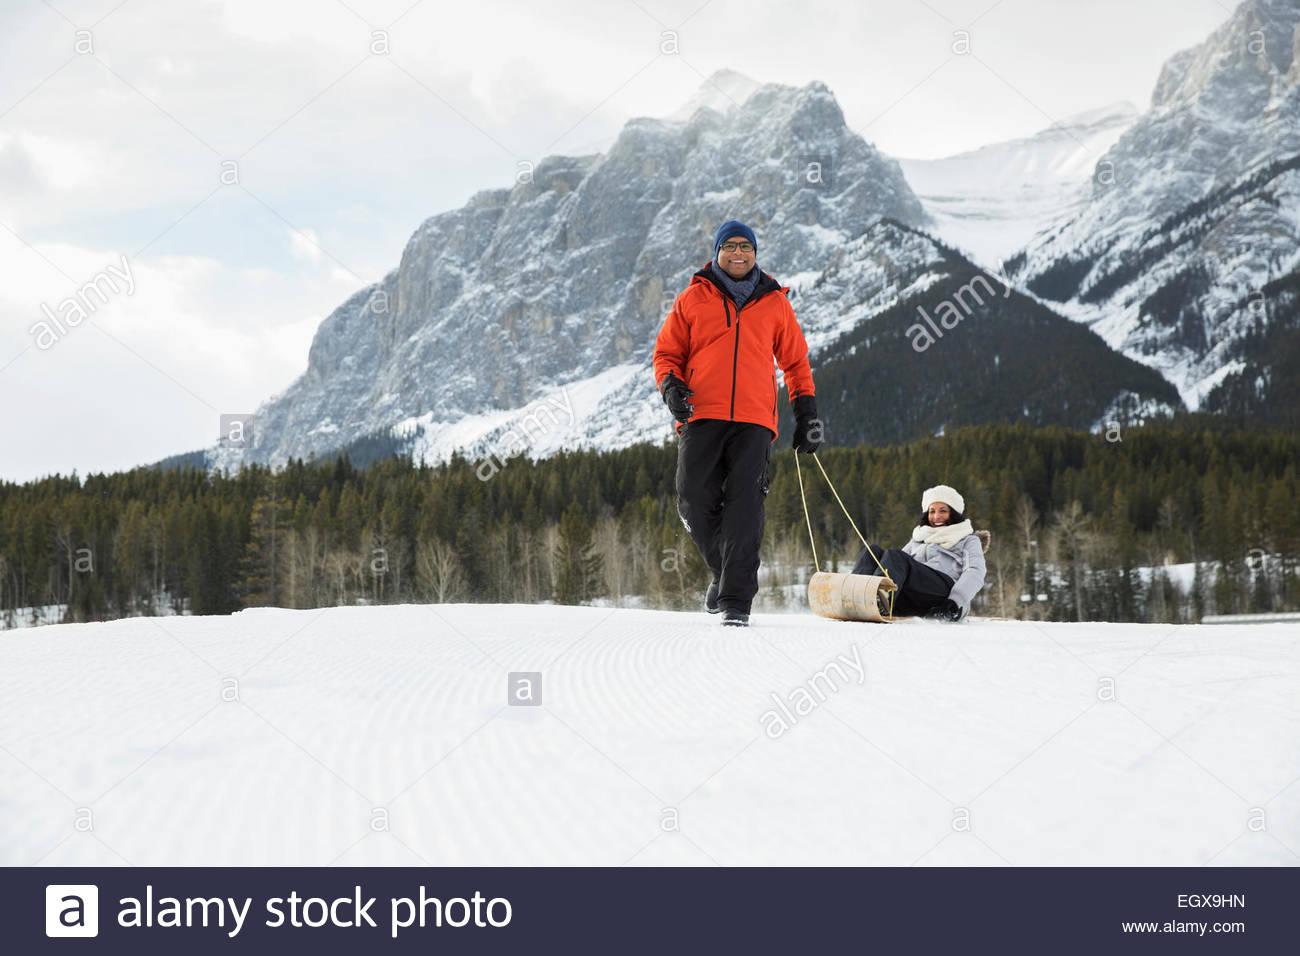 Mari Femme tirant on sled in snowy field Photo Stock